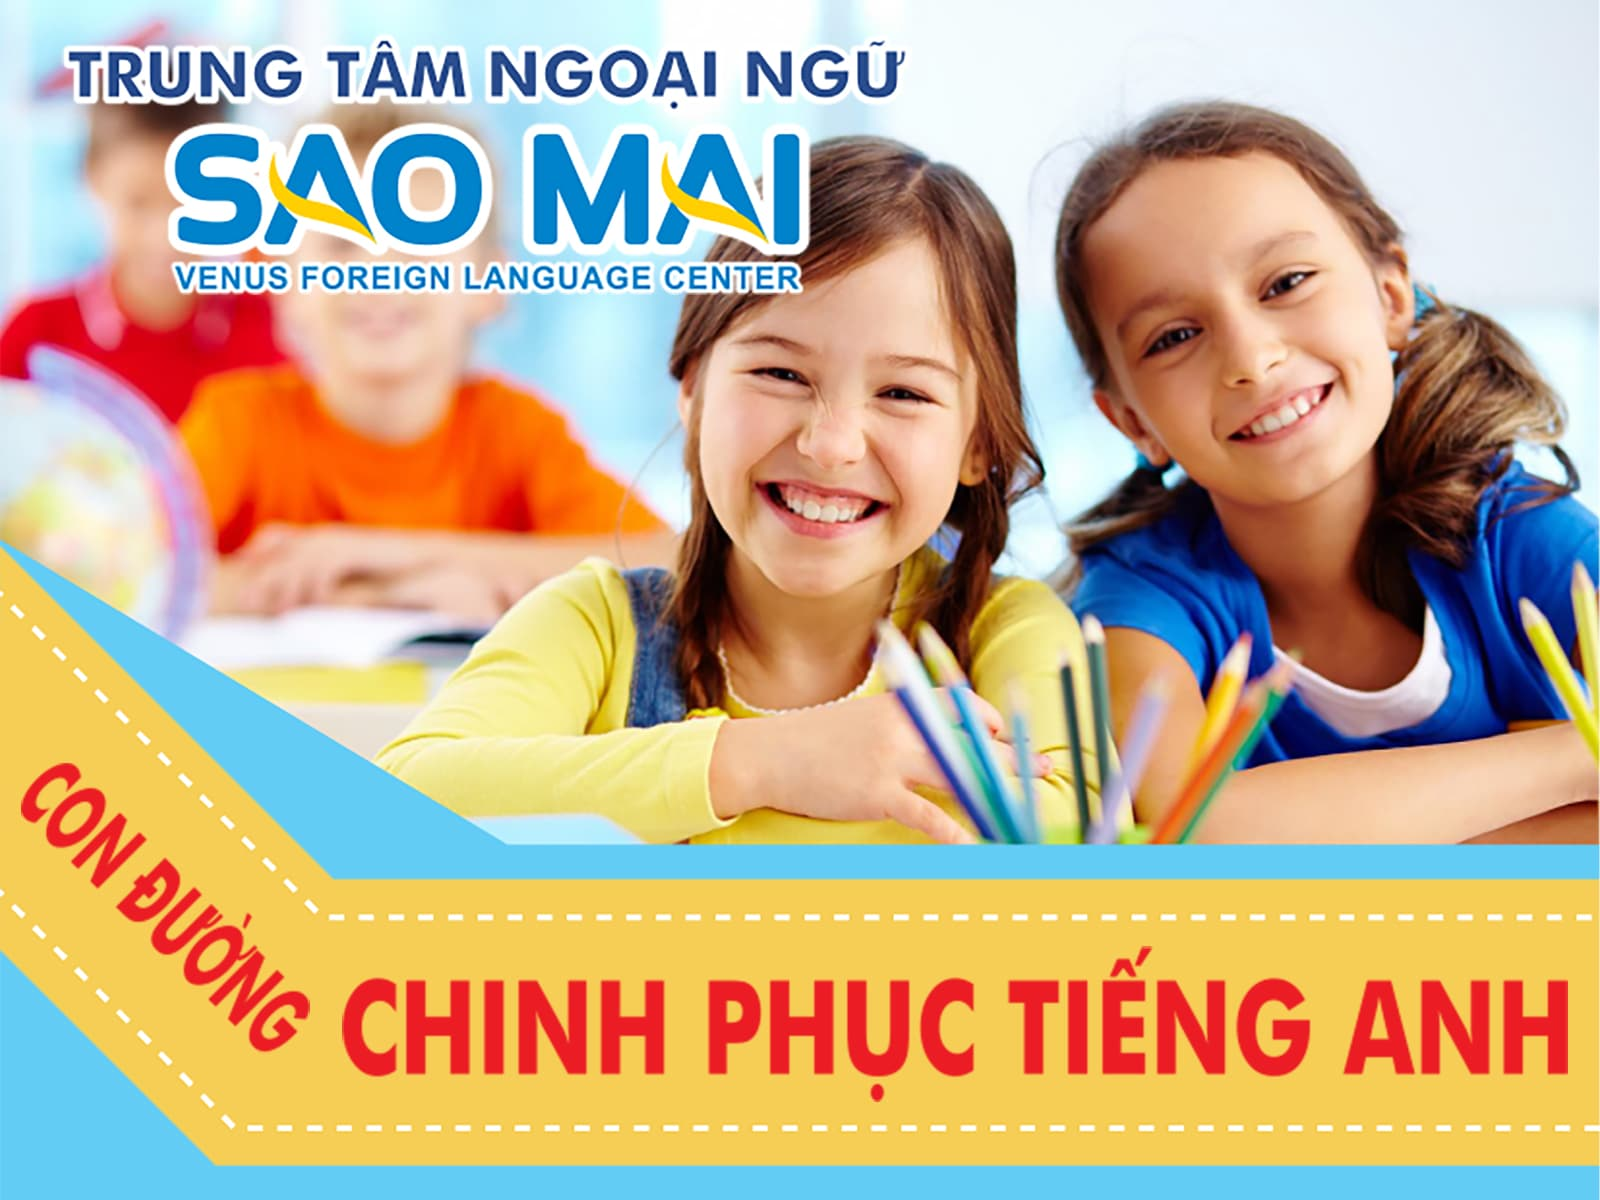 ngoaingusaomai.edu.vn